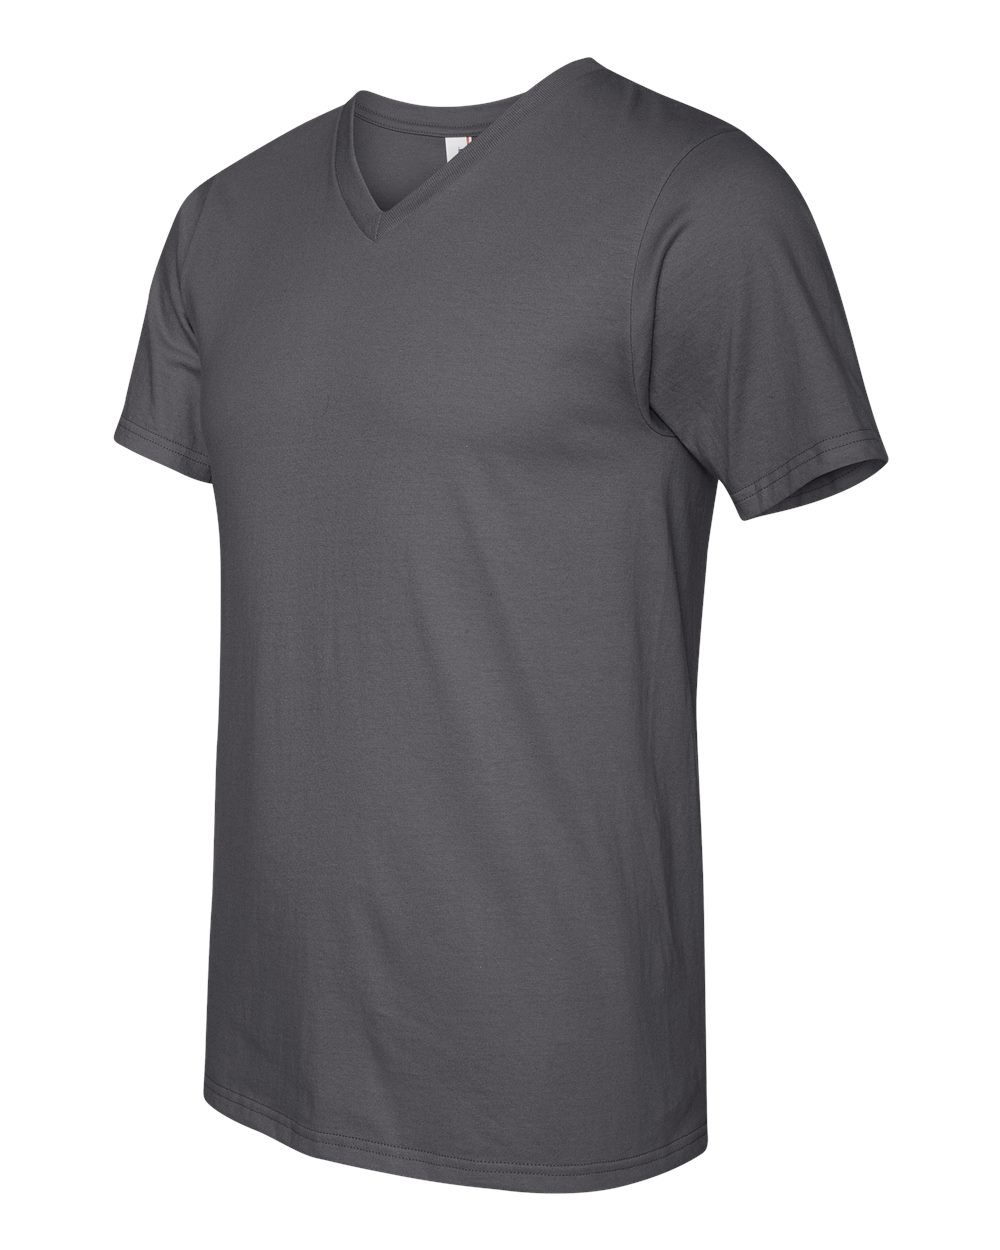 Anvil-Men-039-s-Lightweight-V-Neck-T-Shirt-982-S-3XL thumbnail 6